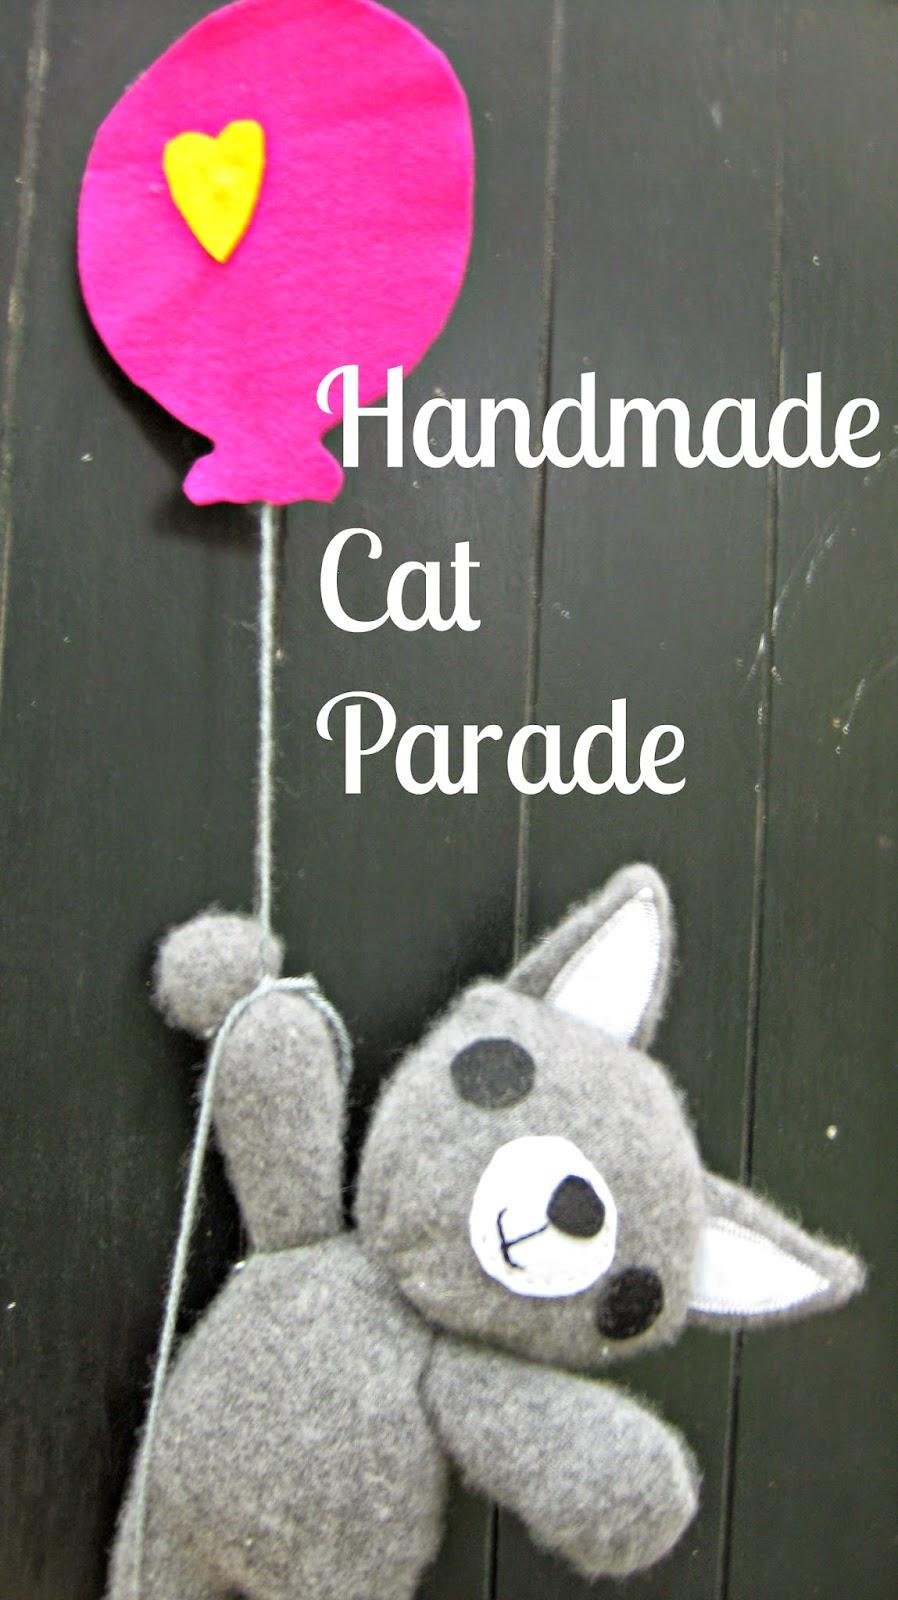 https://www.etsy.com/shop/HandmadeCatParade?ref=hdr_shop_menu